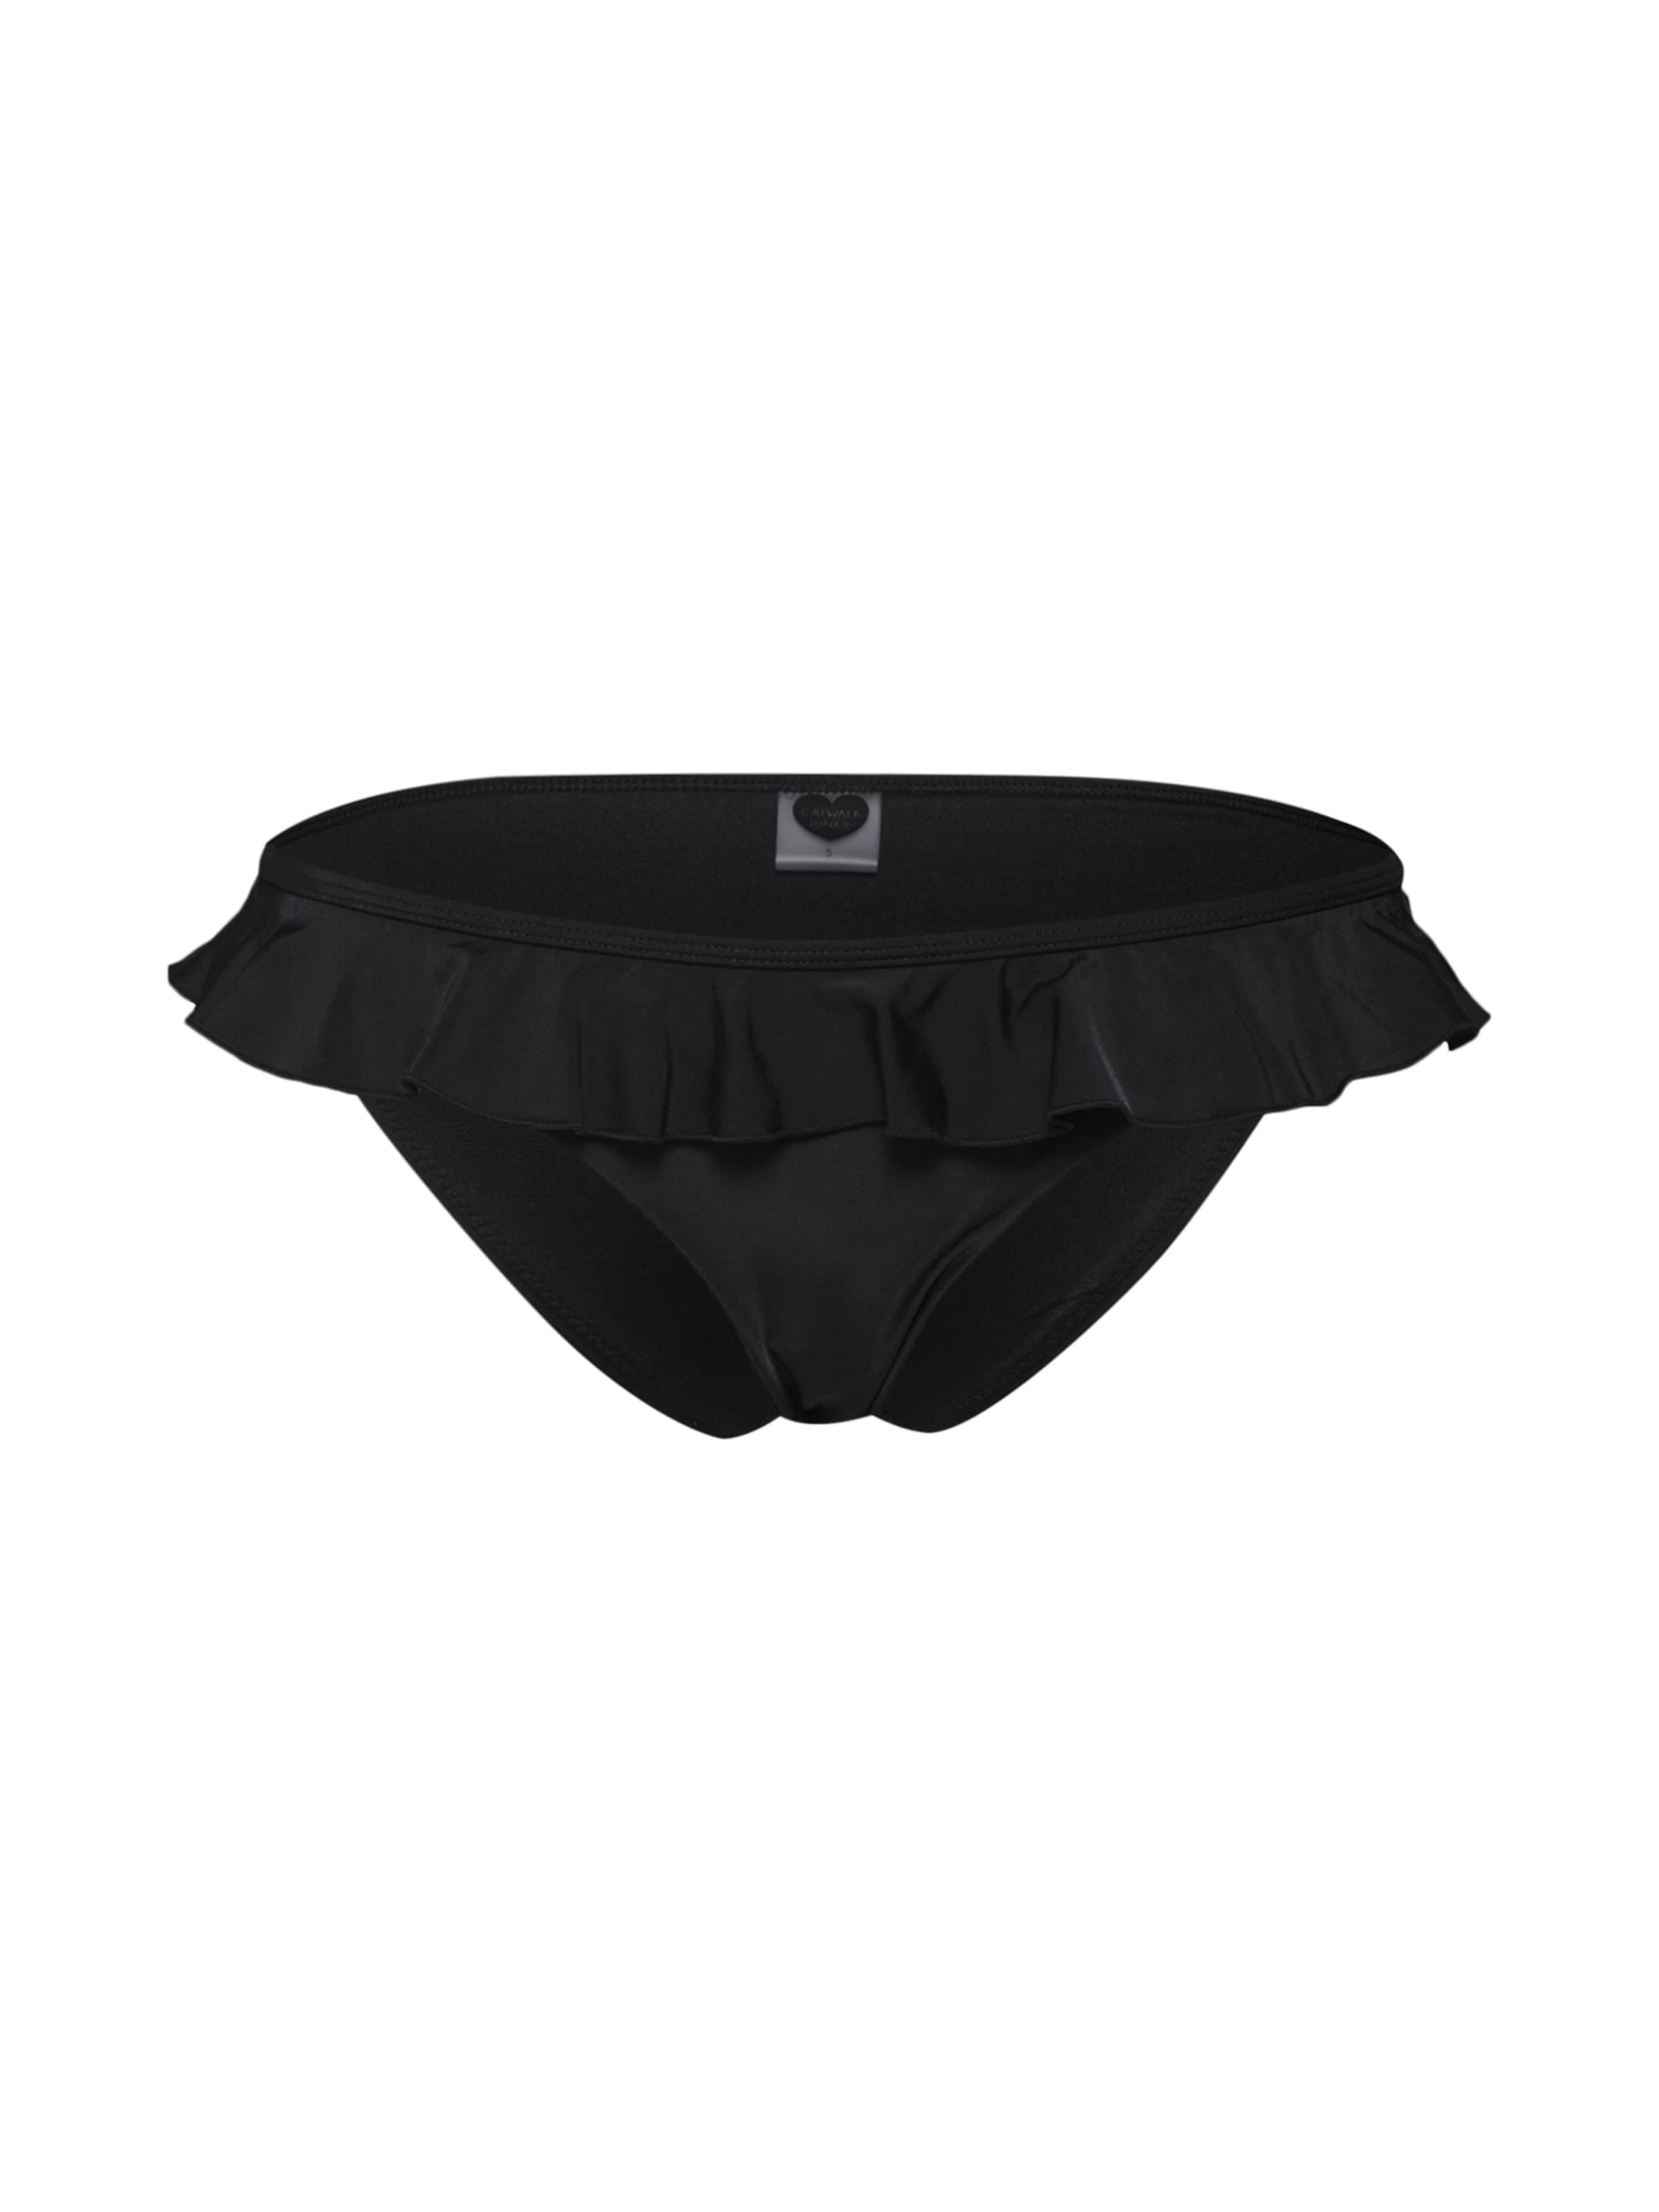 's Summer Bas De Junkie Bottom En Ruffle ' Catwalk Noir Bikini Pn80kwXO